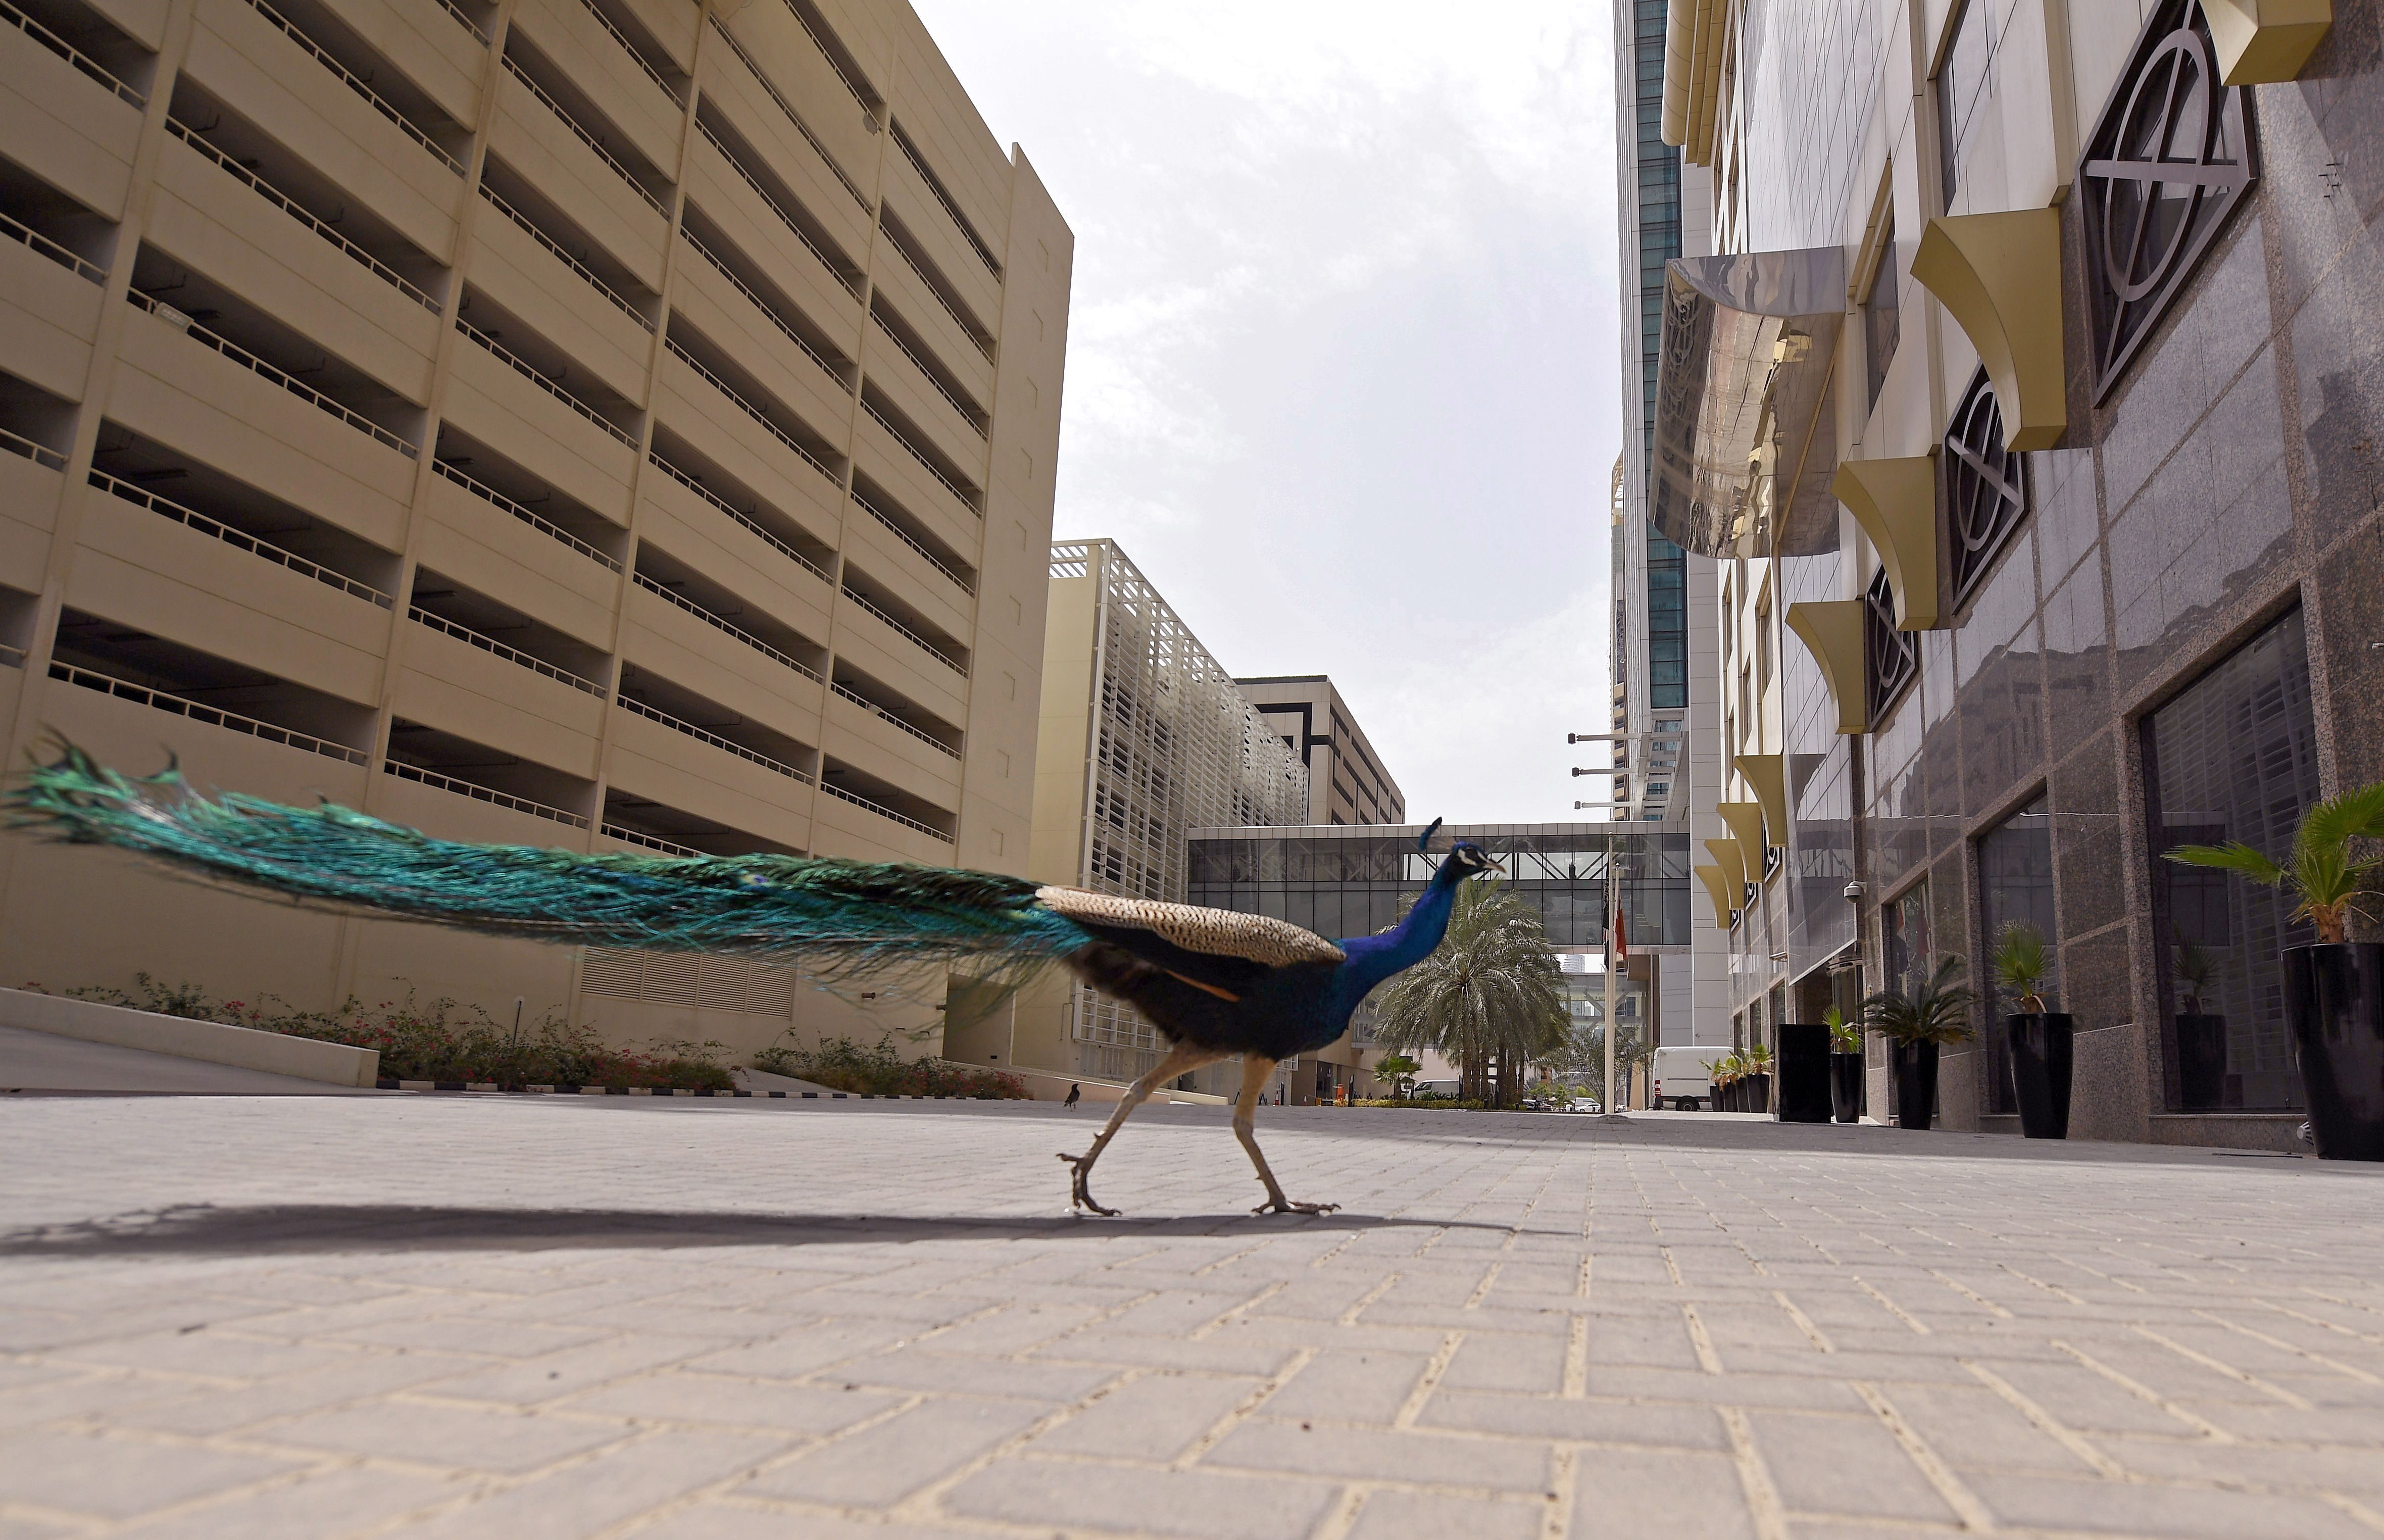 Peacock walking on desolate street in Dubai